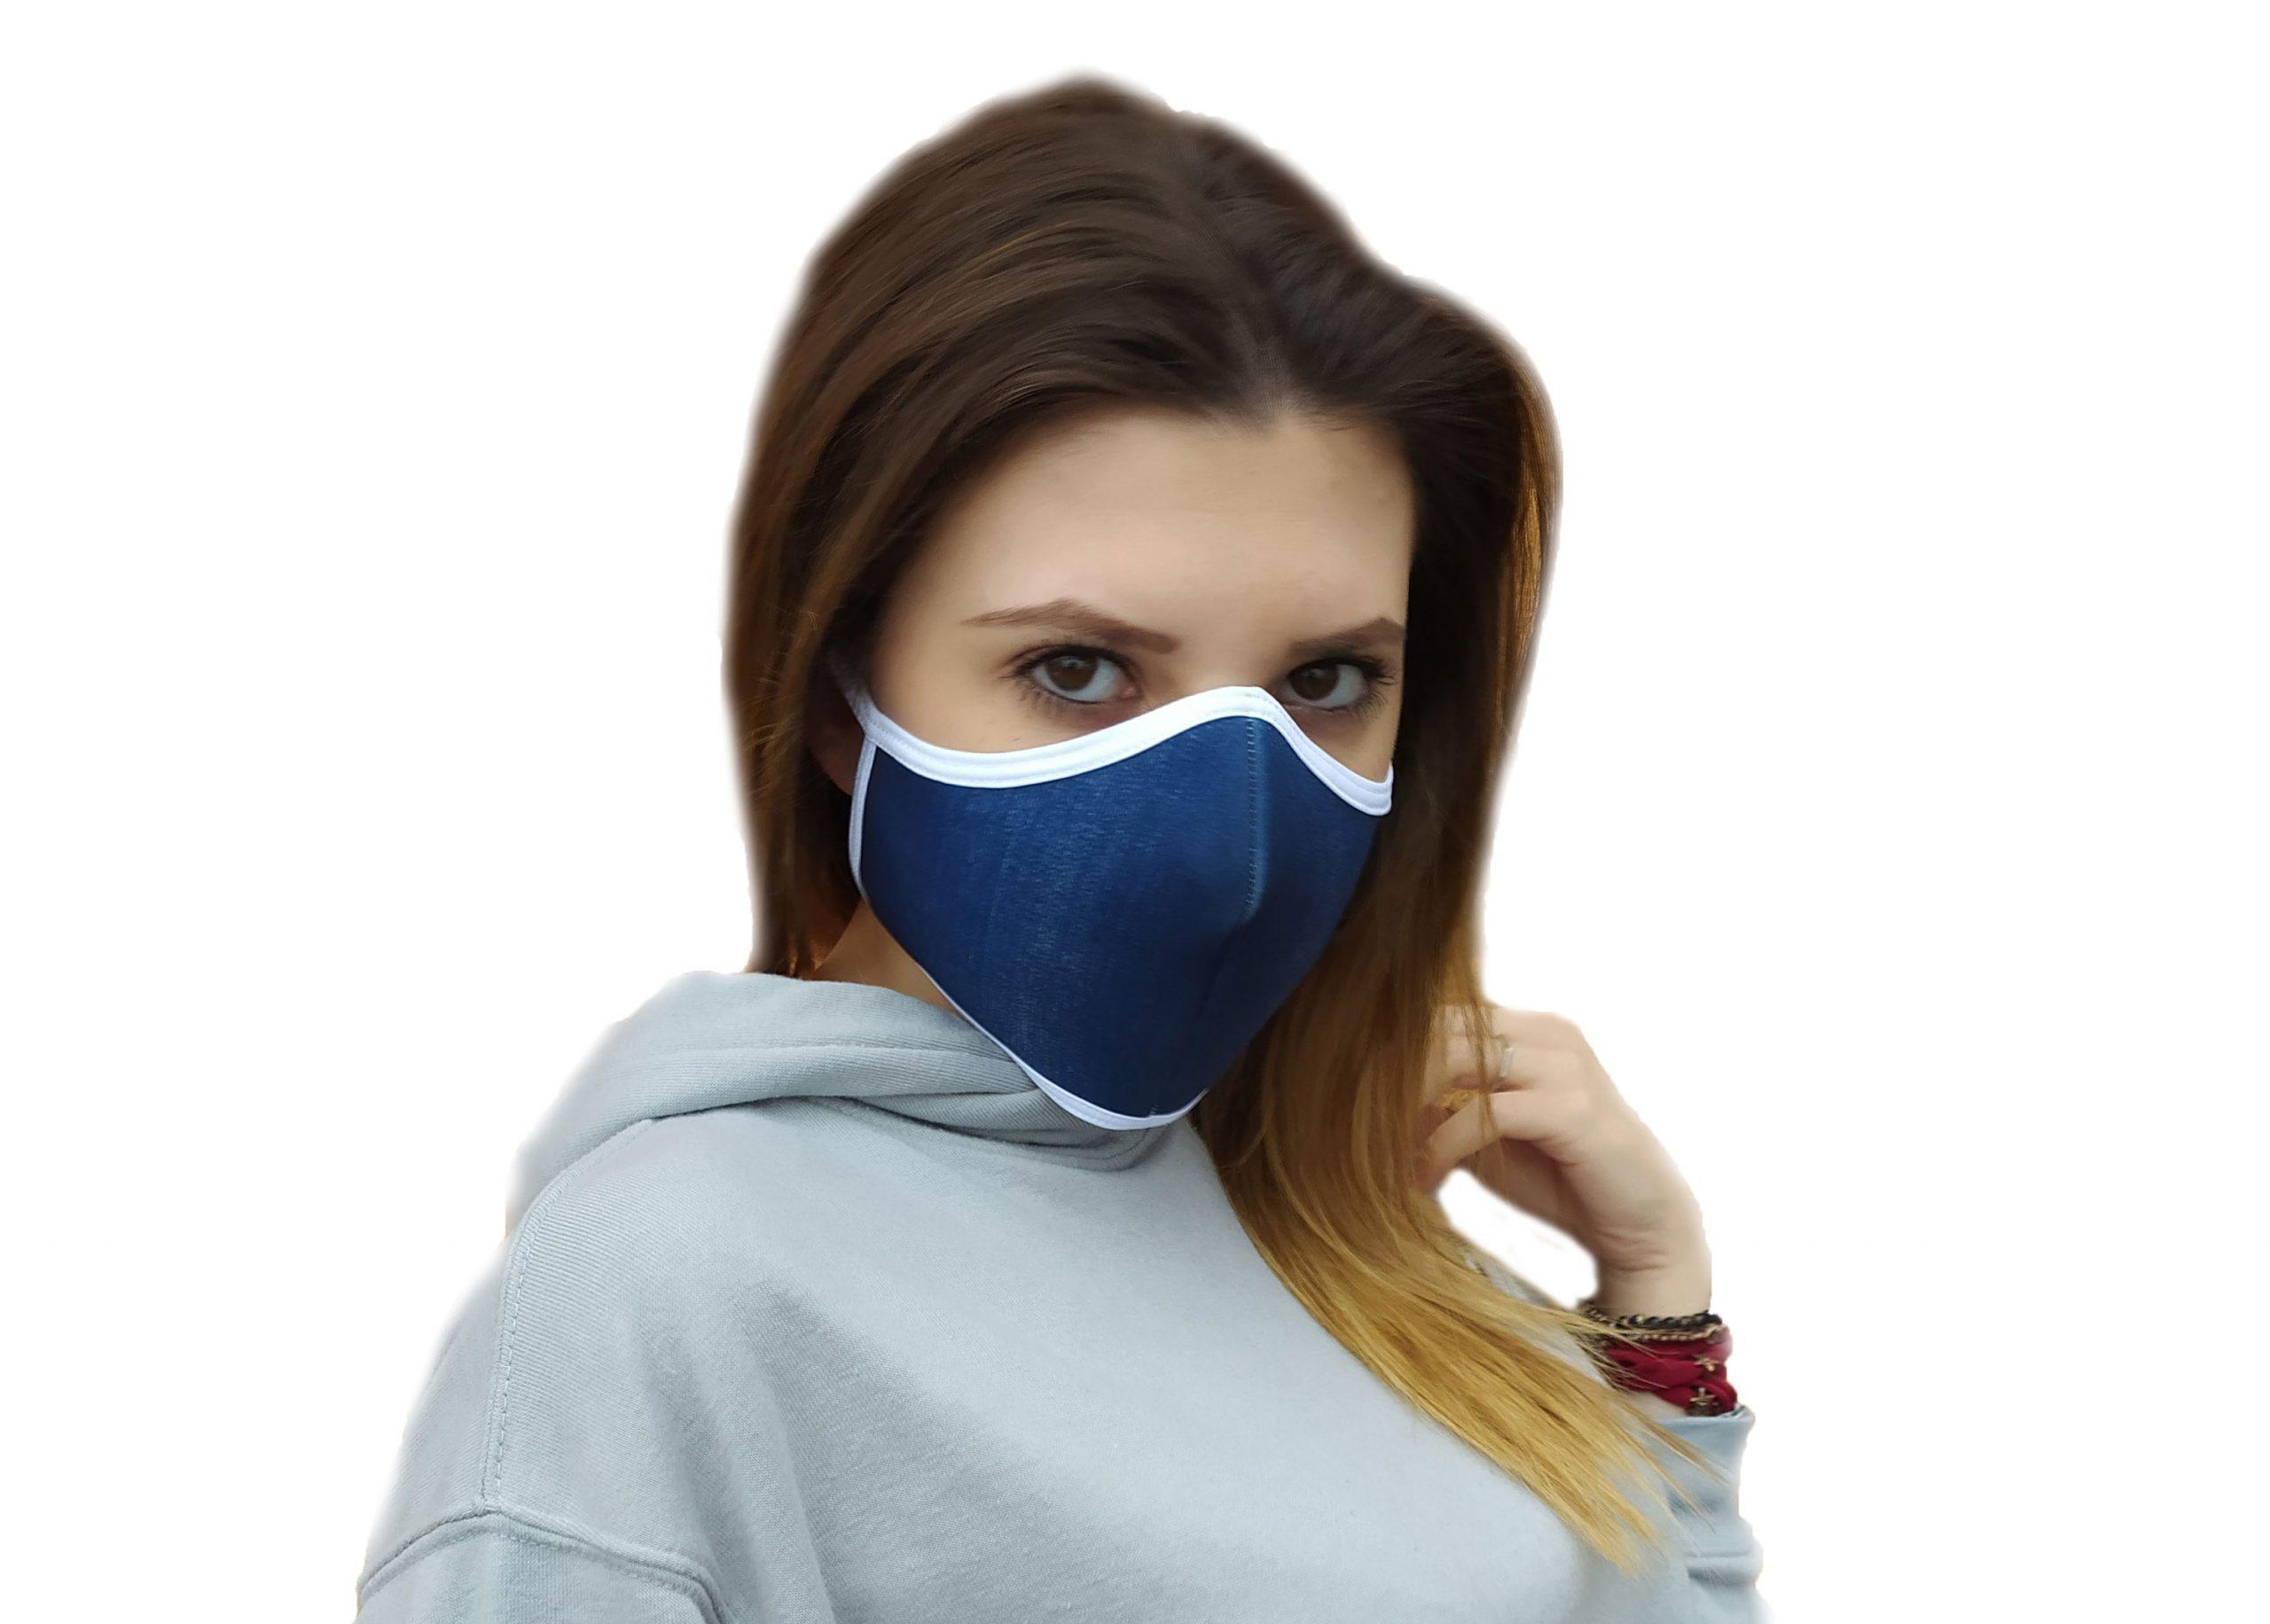 Le mascherine di Attex